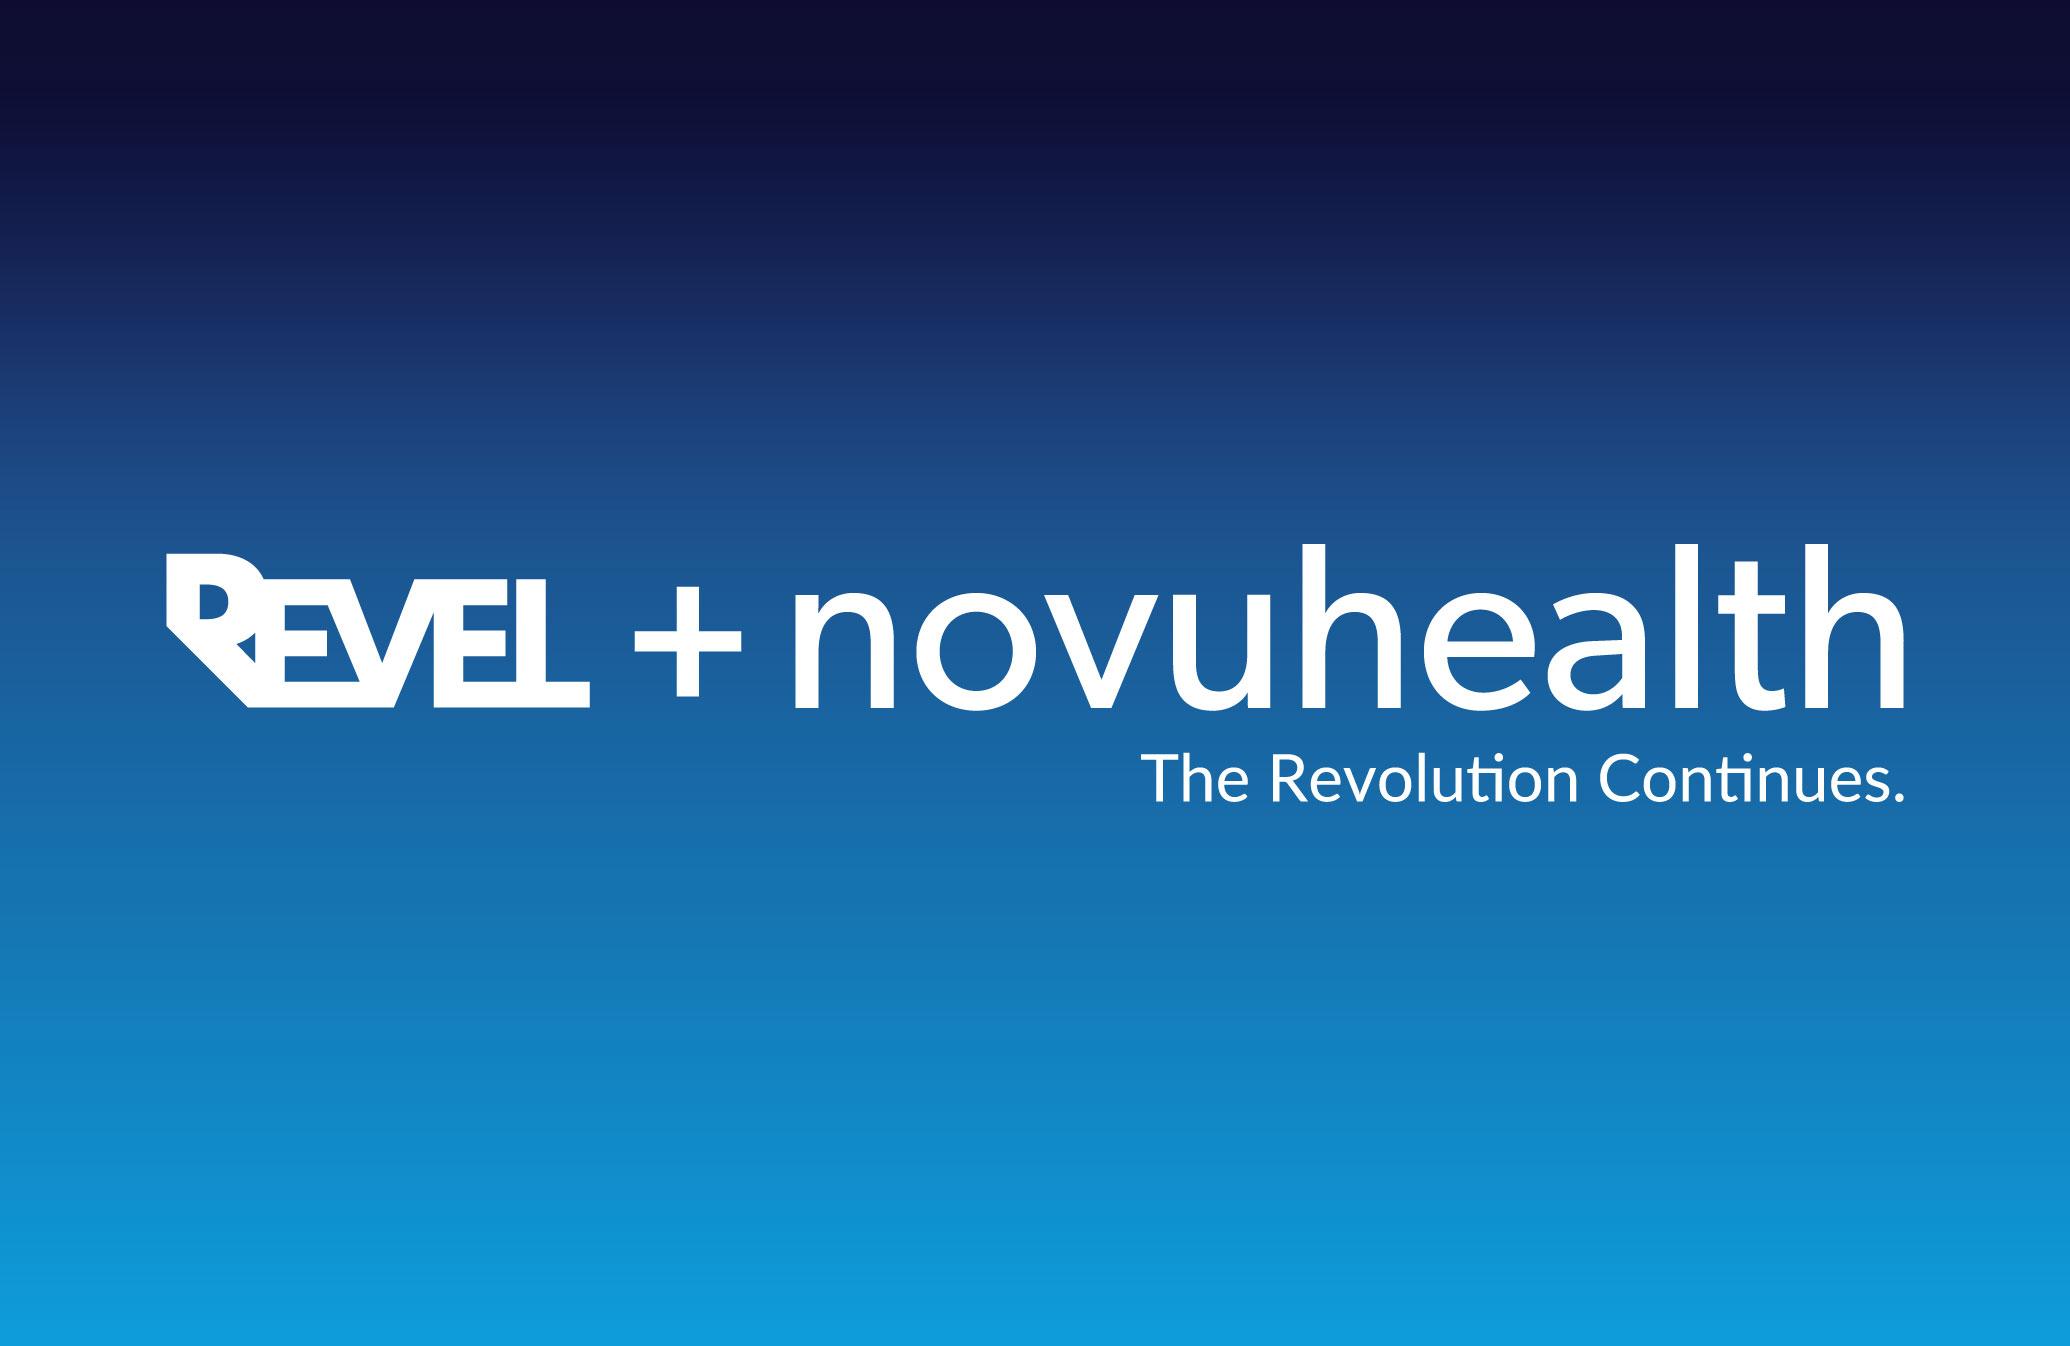 Revel + NovuHealth